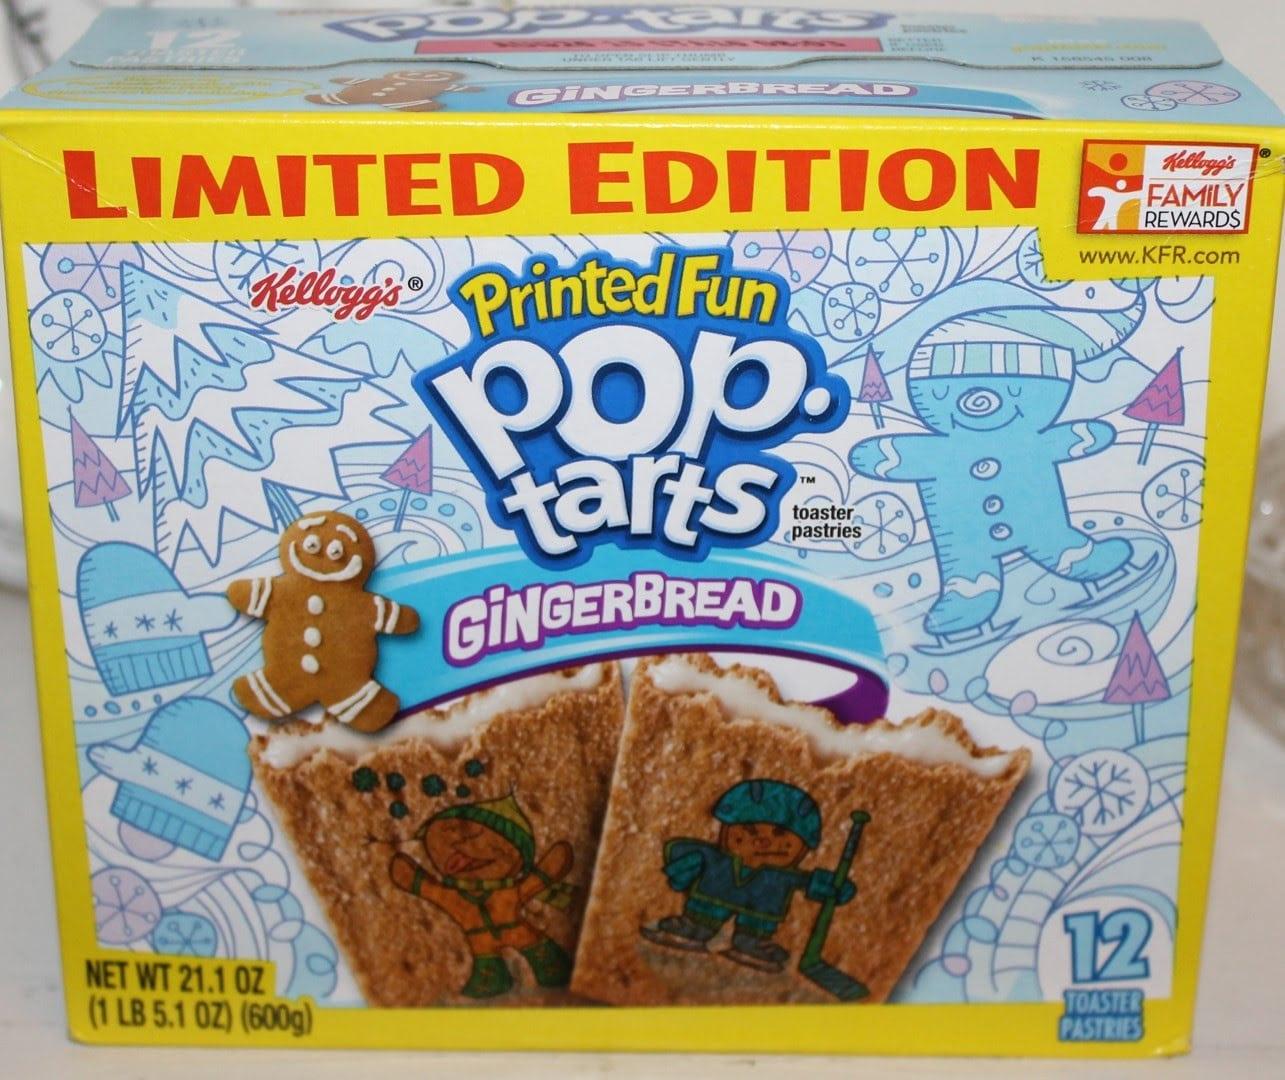 Gingerbread Pop Tarts Taste Test & Review